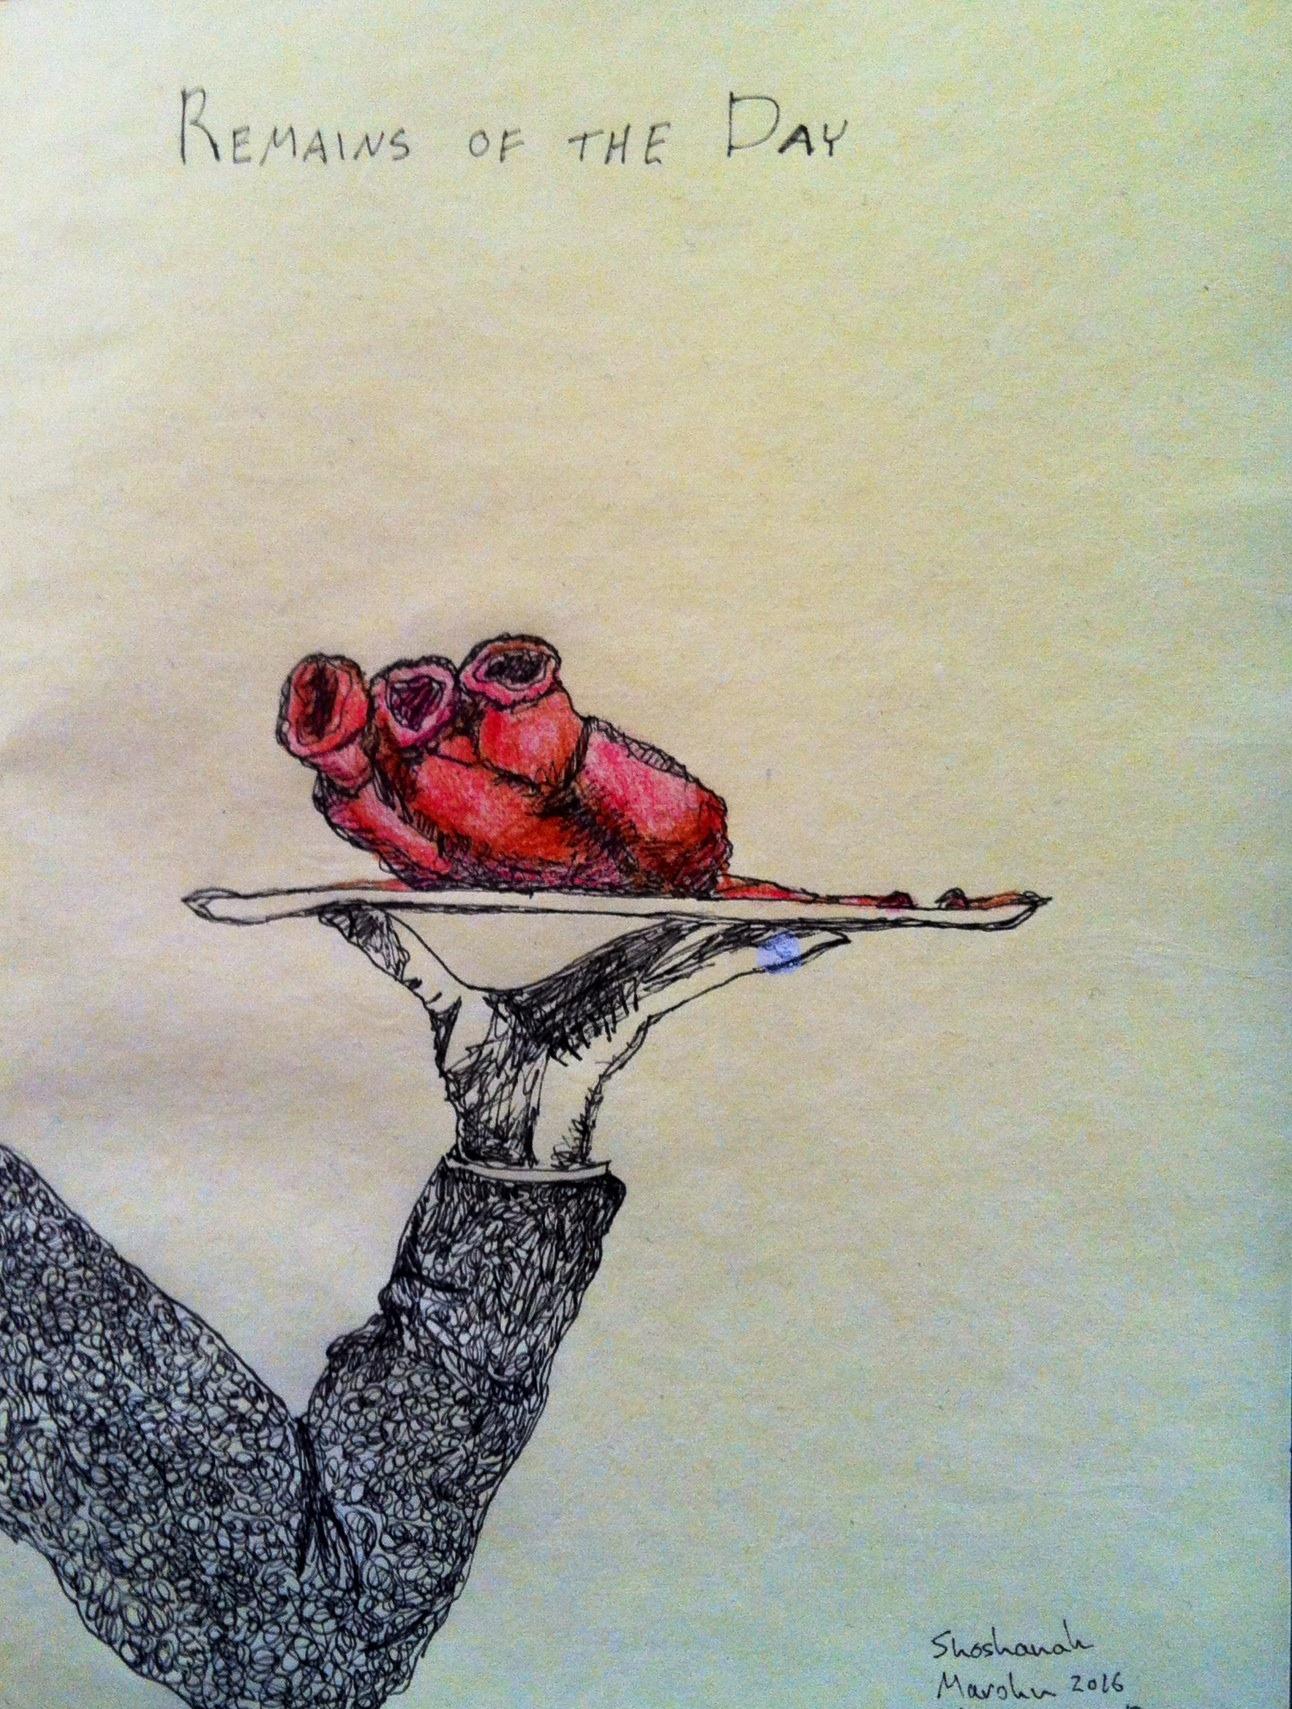 Happy Valentine's Day from Shoshanah Marohn 2016